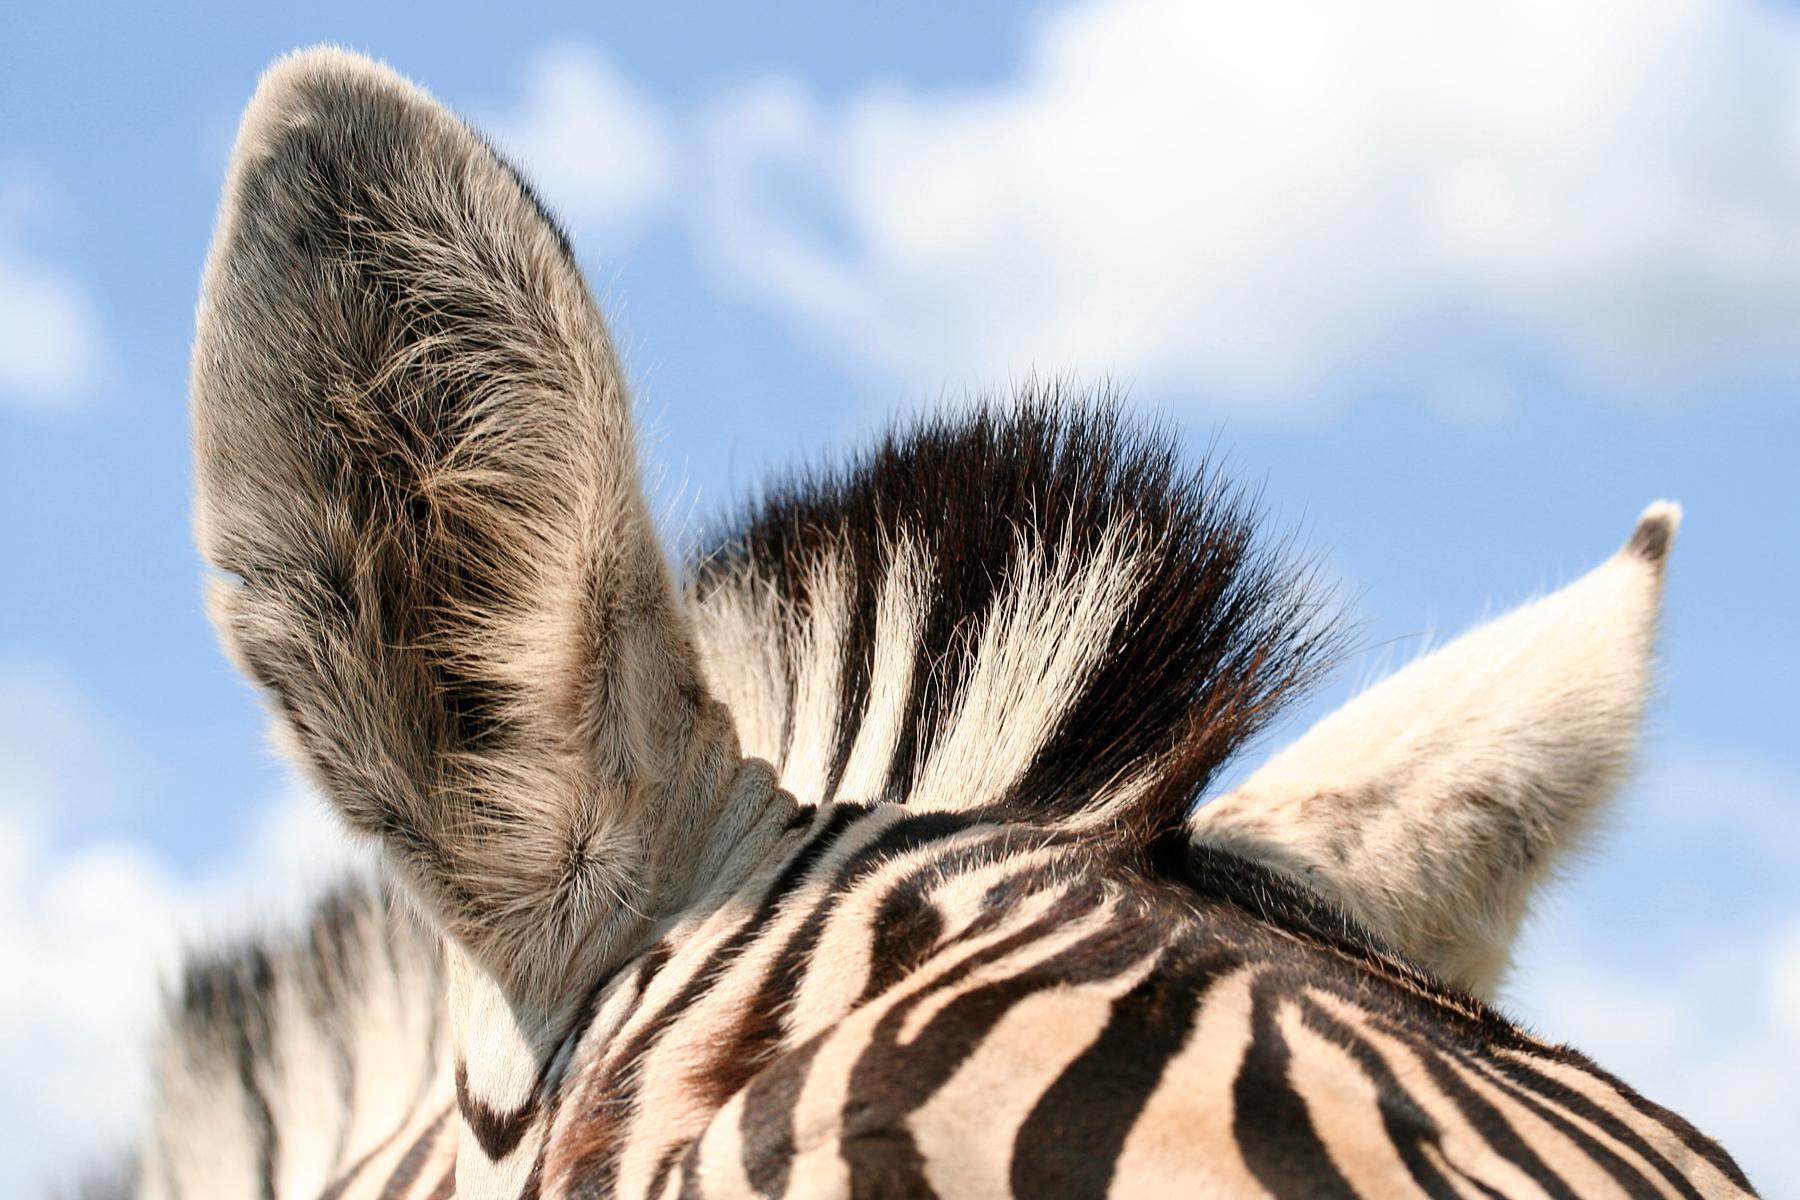 Zebra Ears, Animal, Image, Macro, Nature, HQ Photo